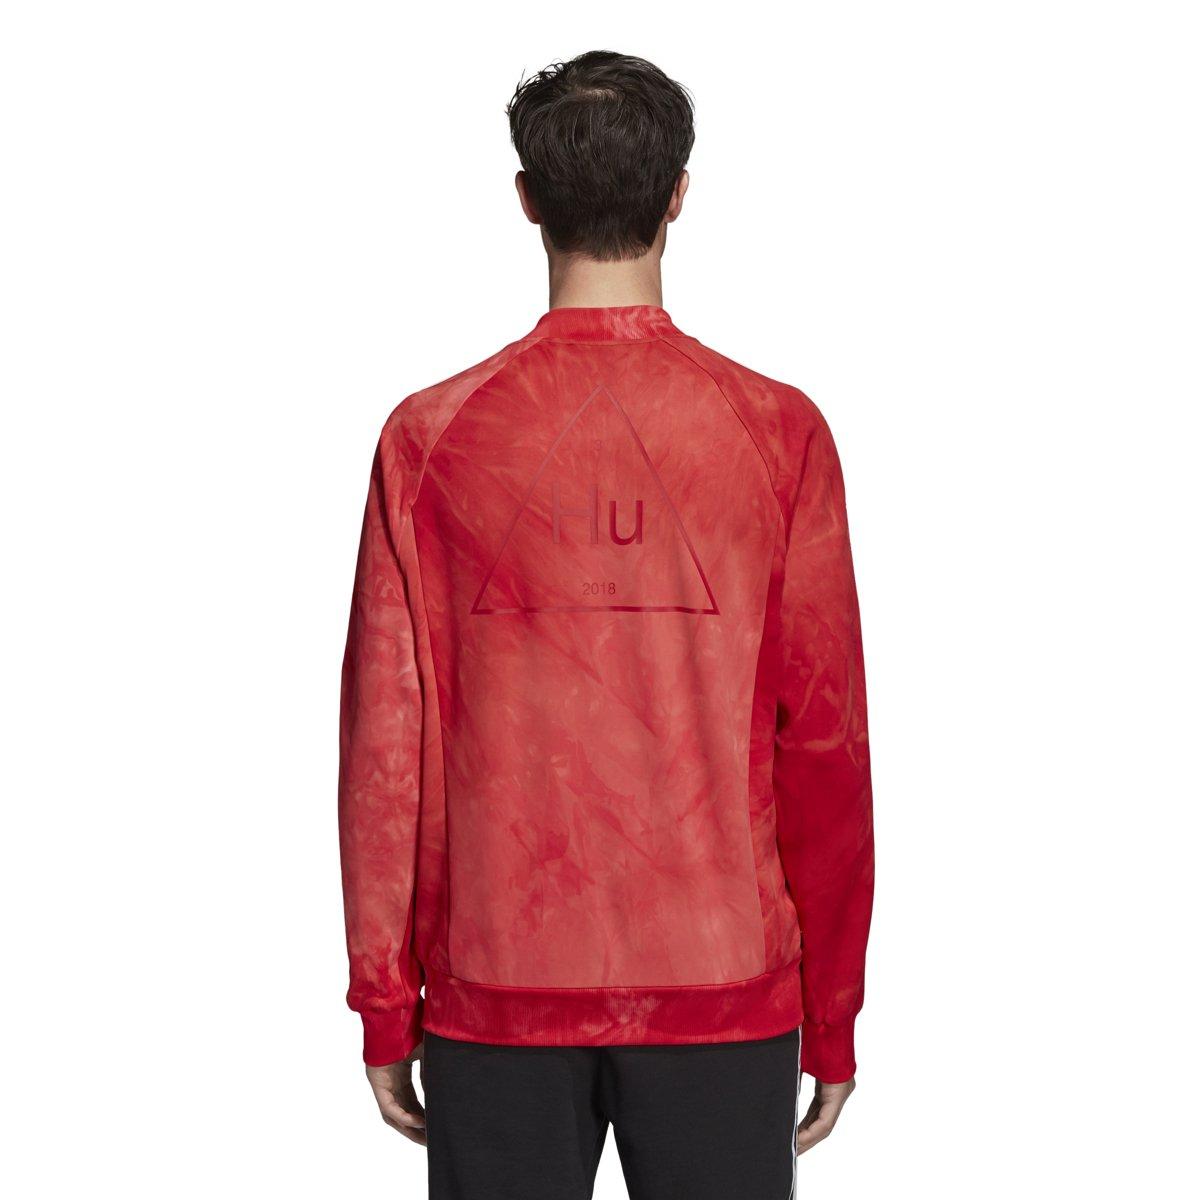 45e7c3081fc22 Adidas Mens hu Holi SSTR TT Jacket CW9105 (L) Scarlet  Amazon.ca  Clothing    Accessories